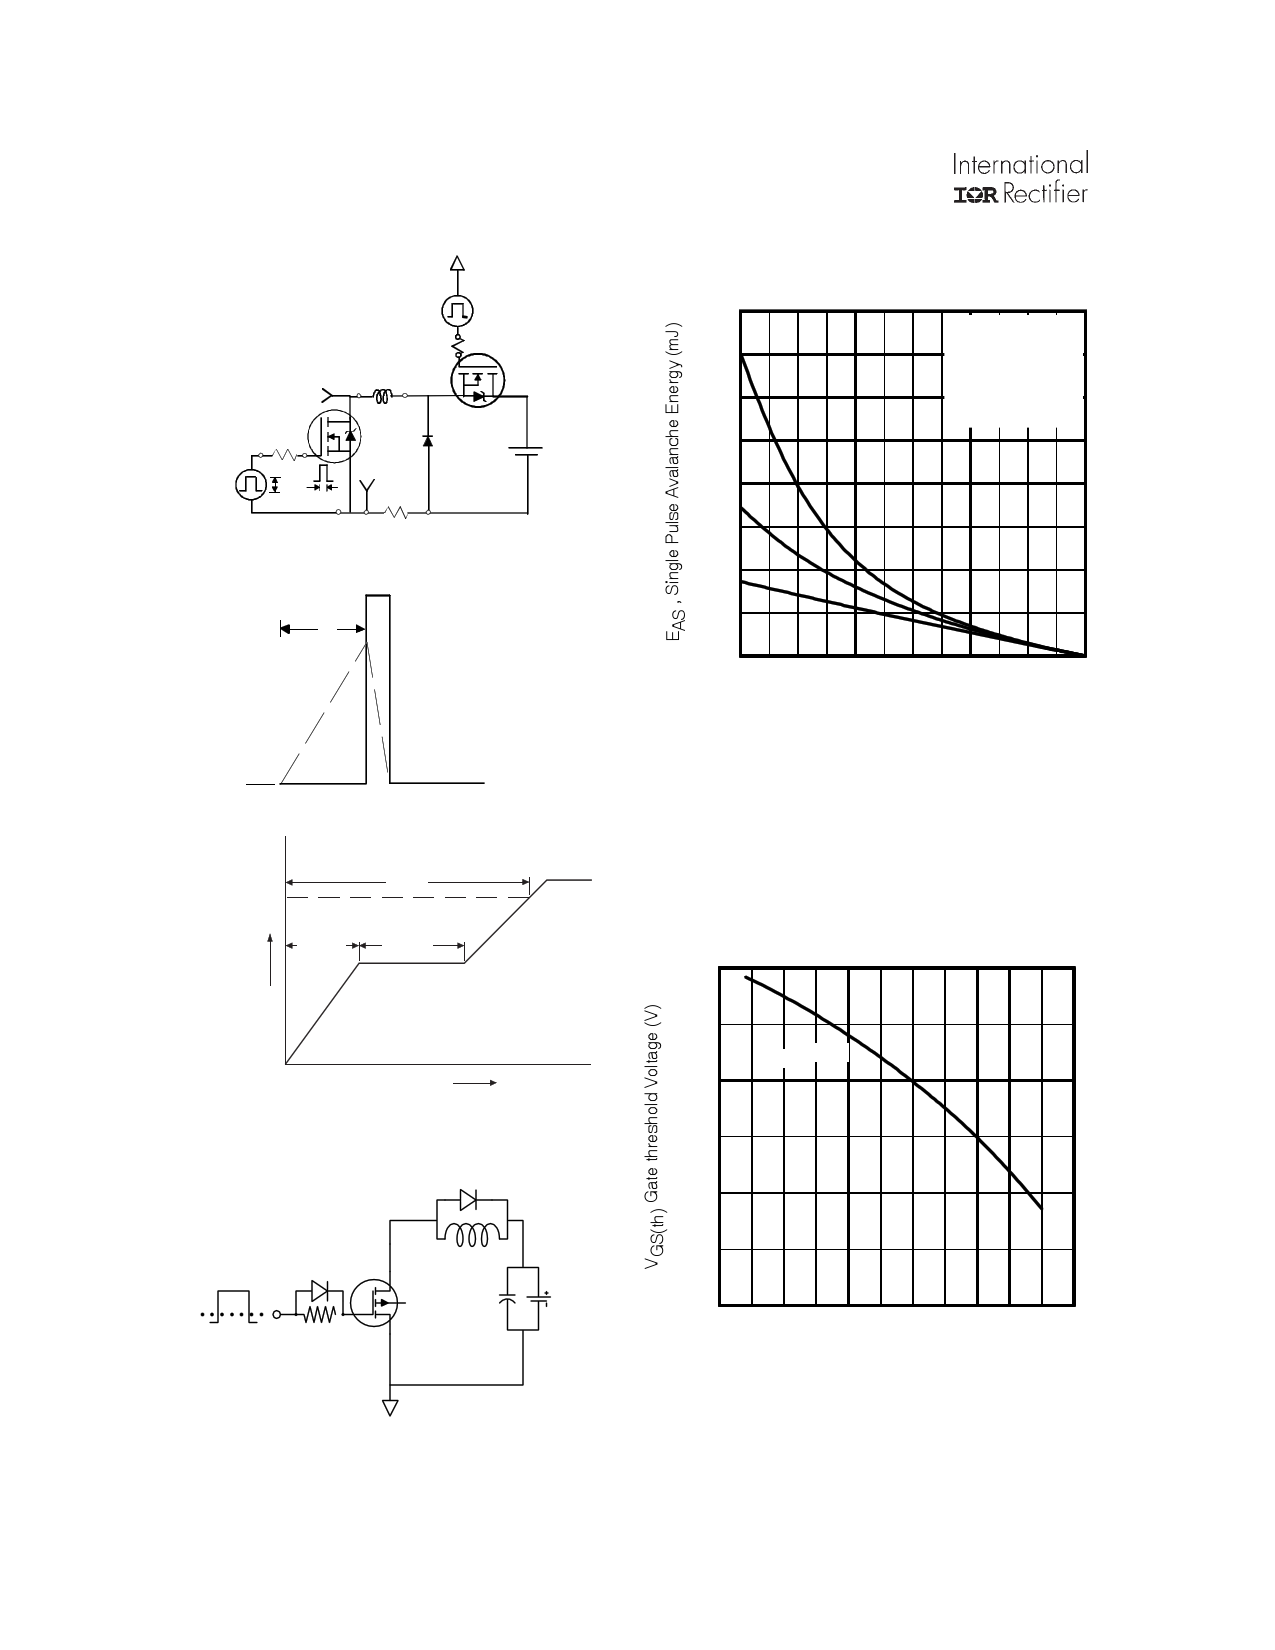 IRFZ44ZSPbF 電子部品, 半導体